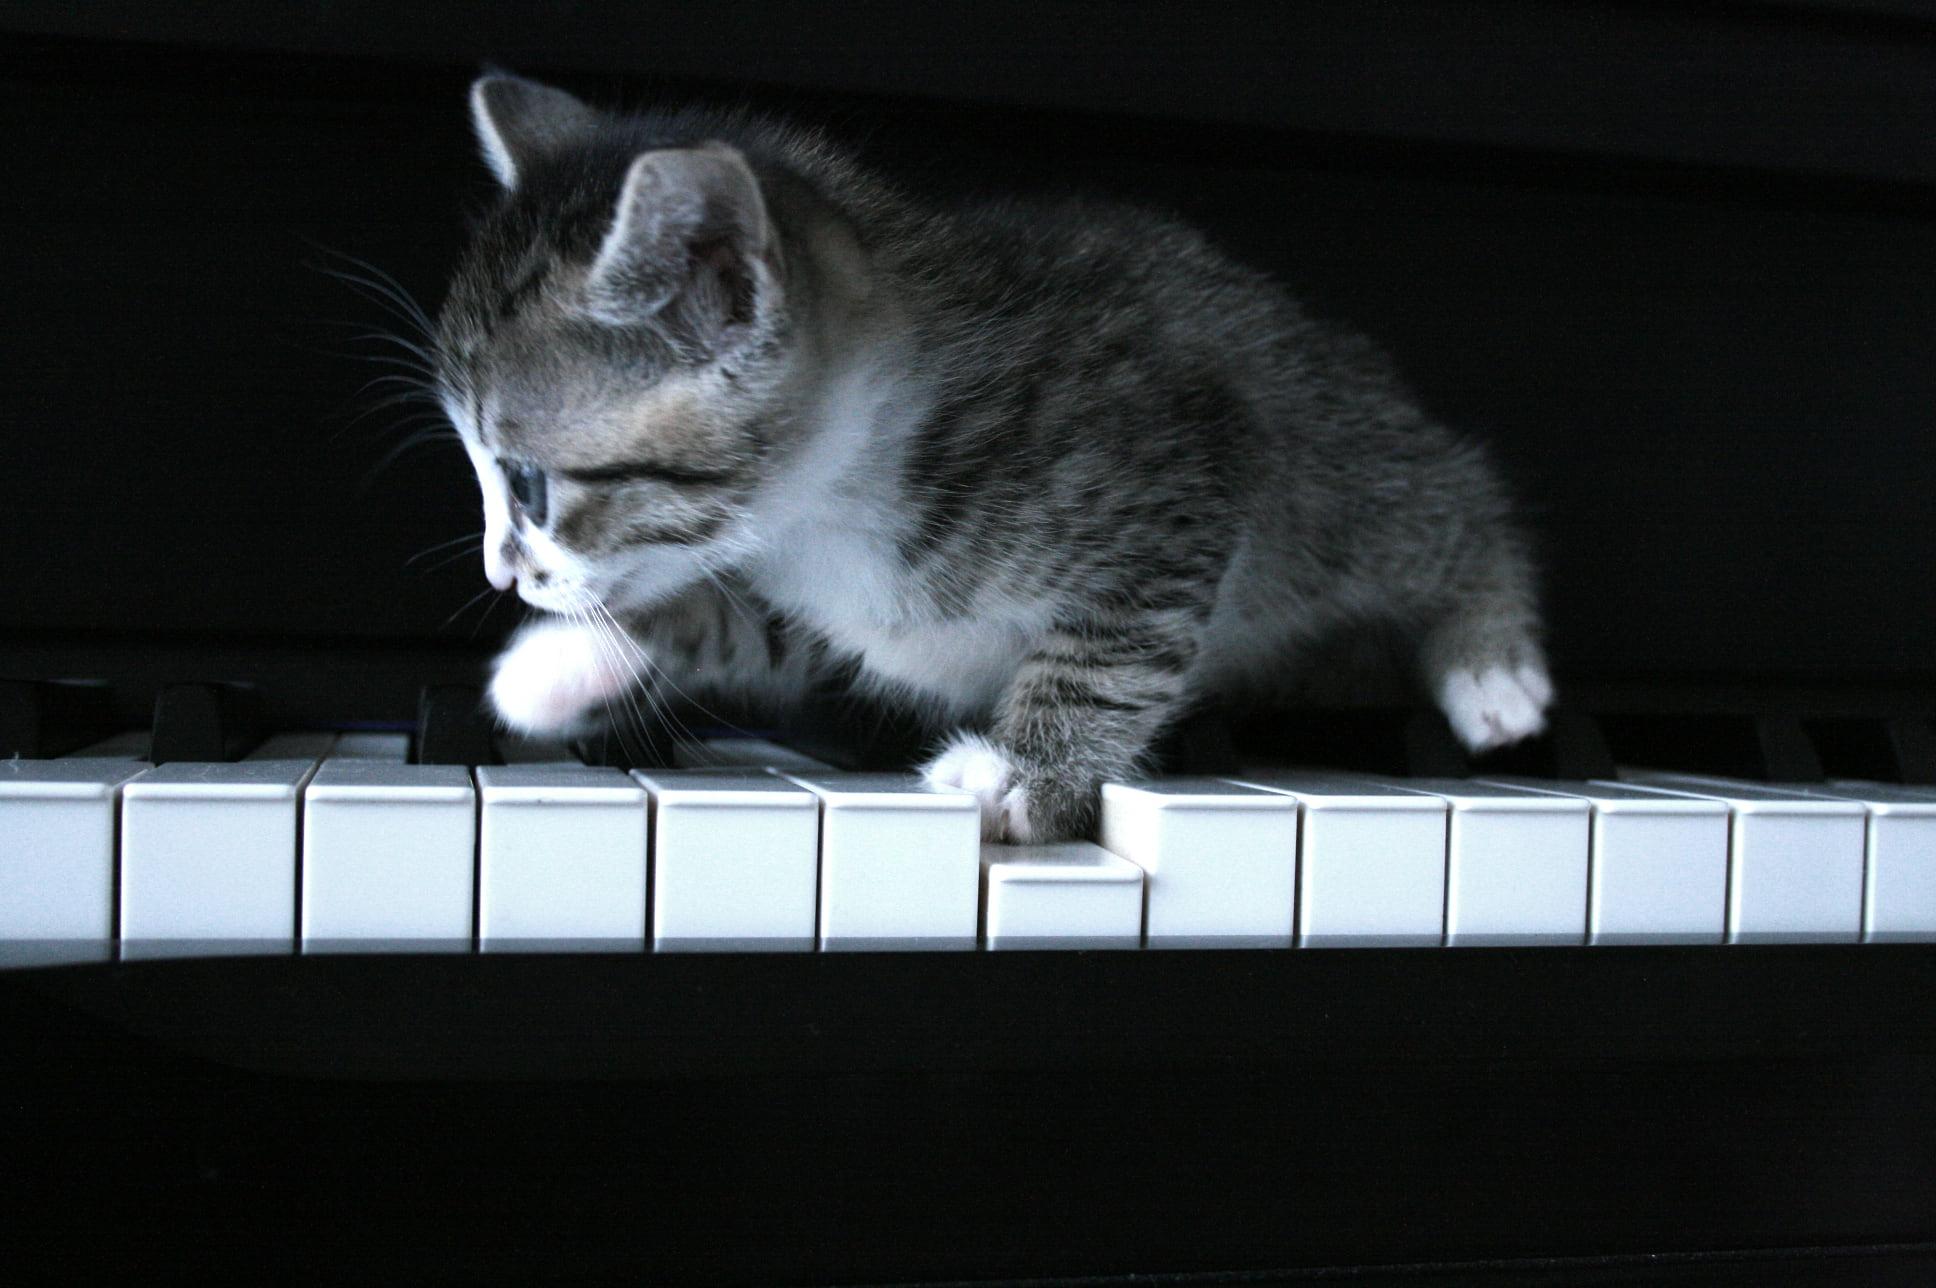 Cat on piano